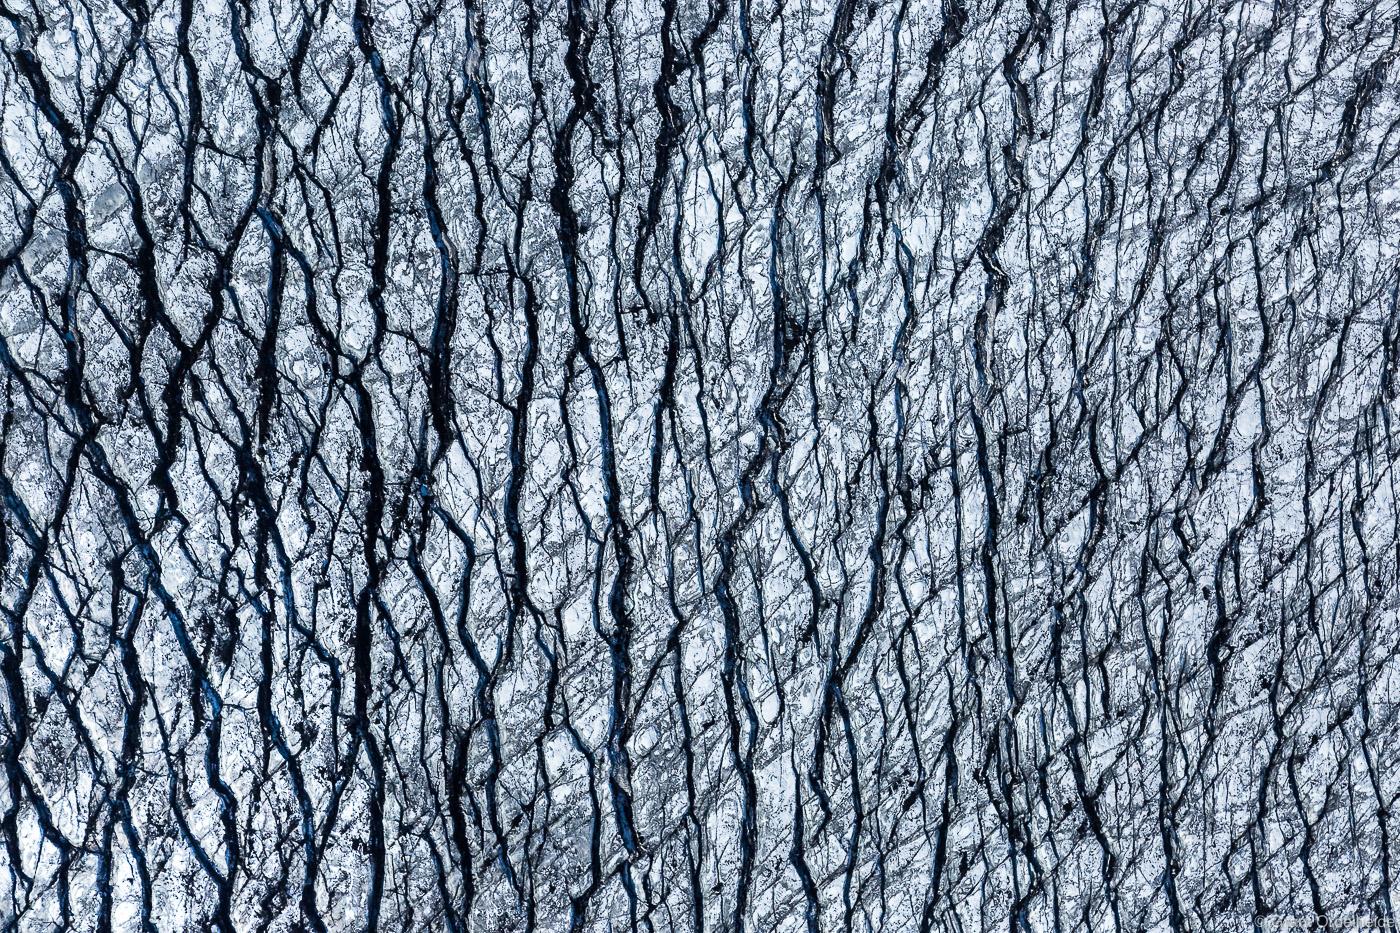 glacier, abstract, vatnajökull, cravases, iceland, aerial, pattern, , photo